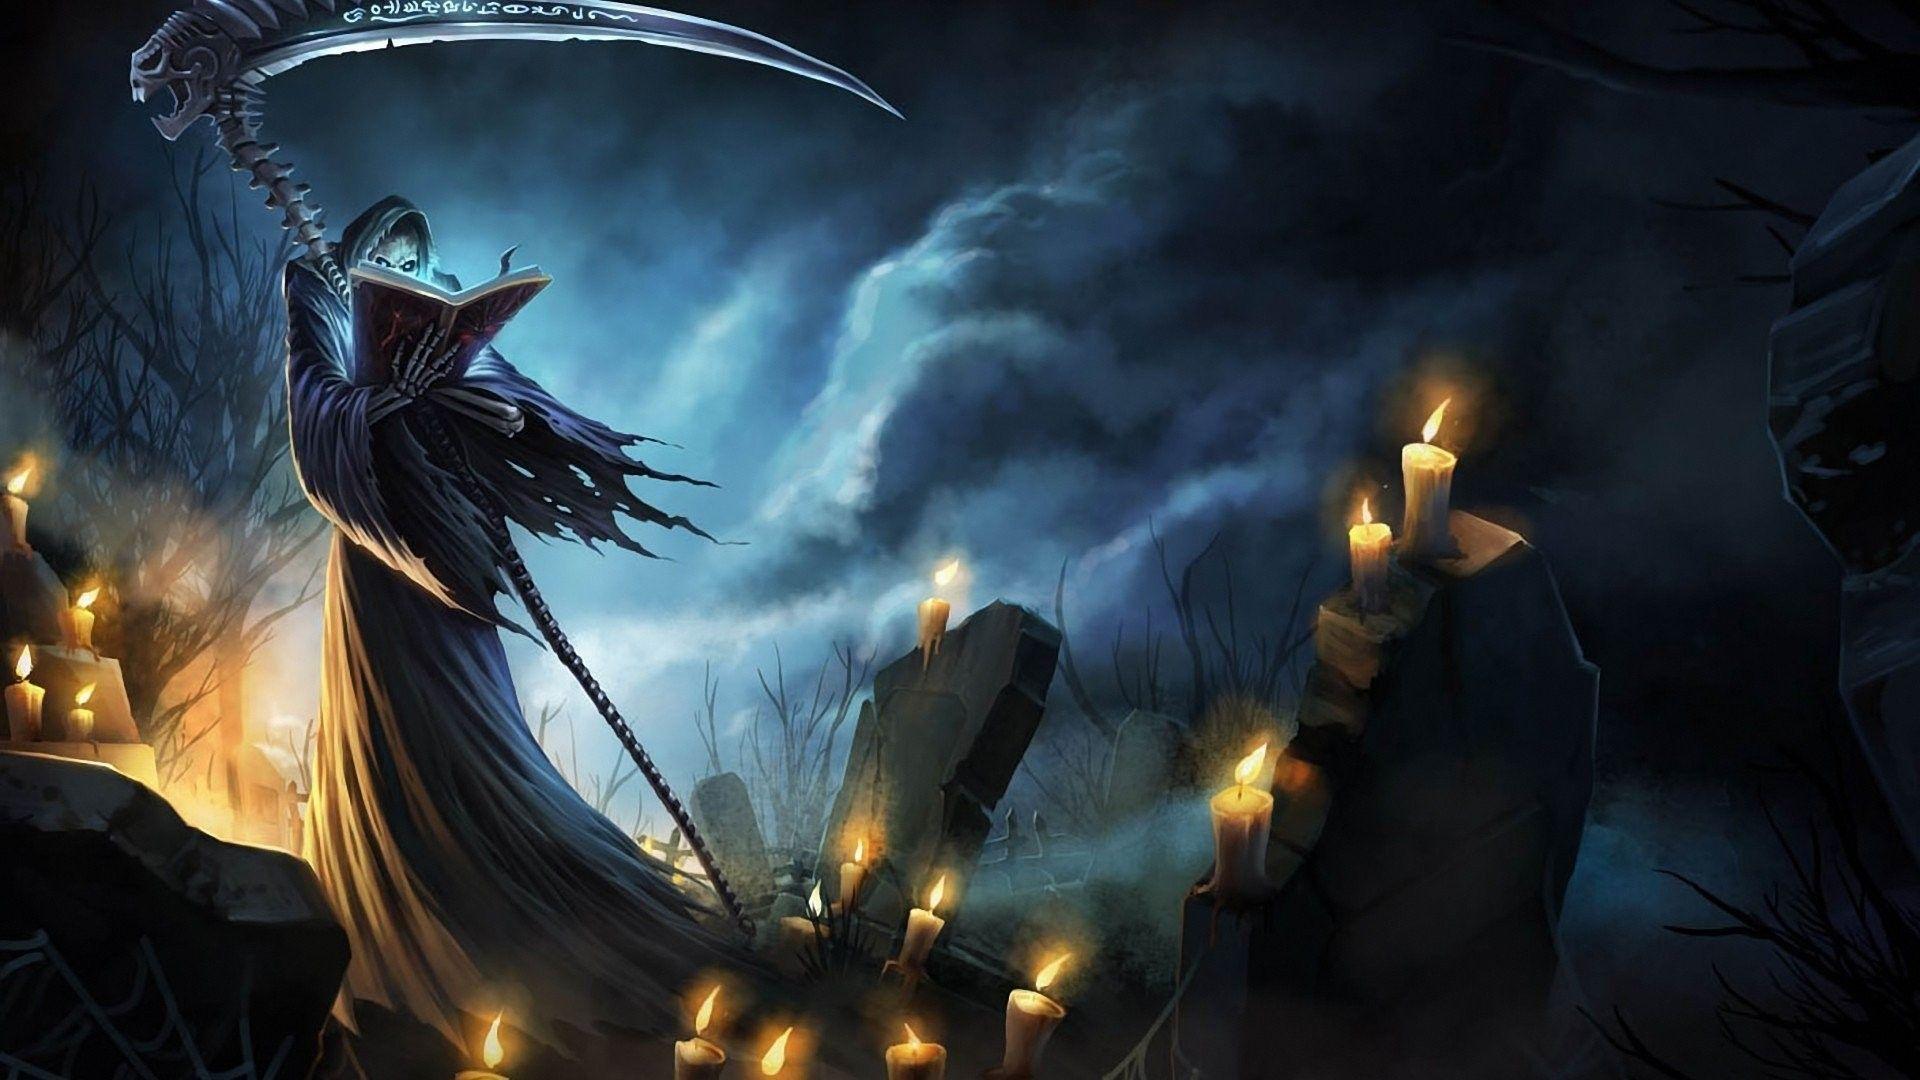 1920x1080 grim reaper in the cemetery fantasy hd desktop wallpaper